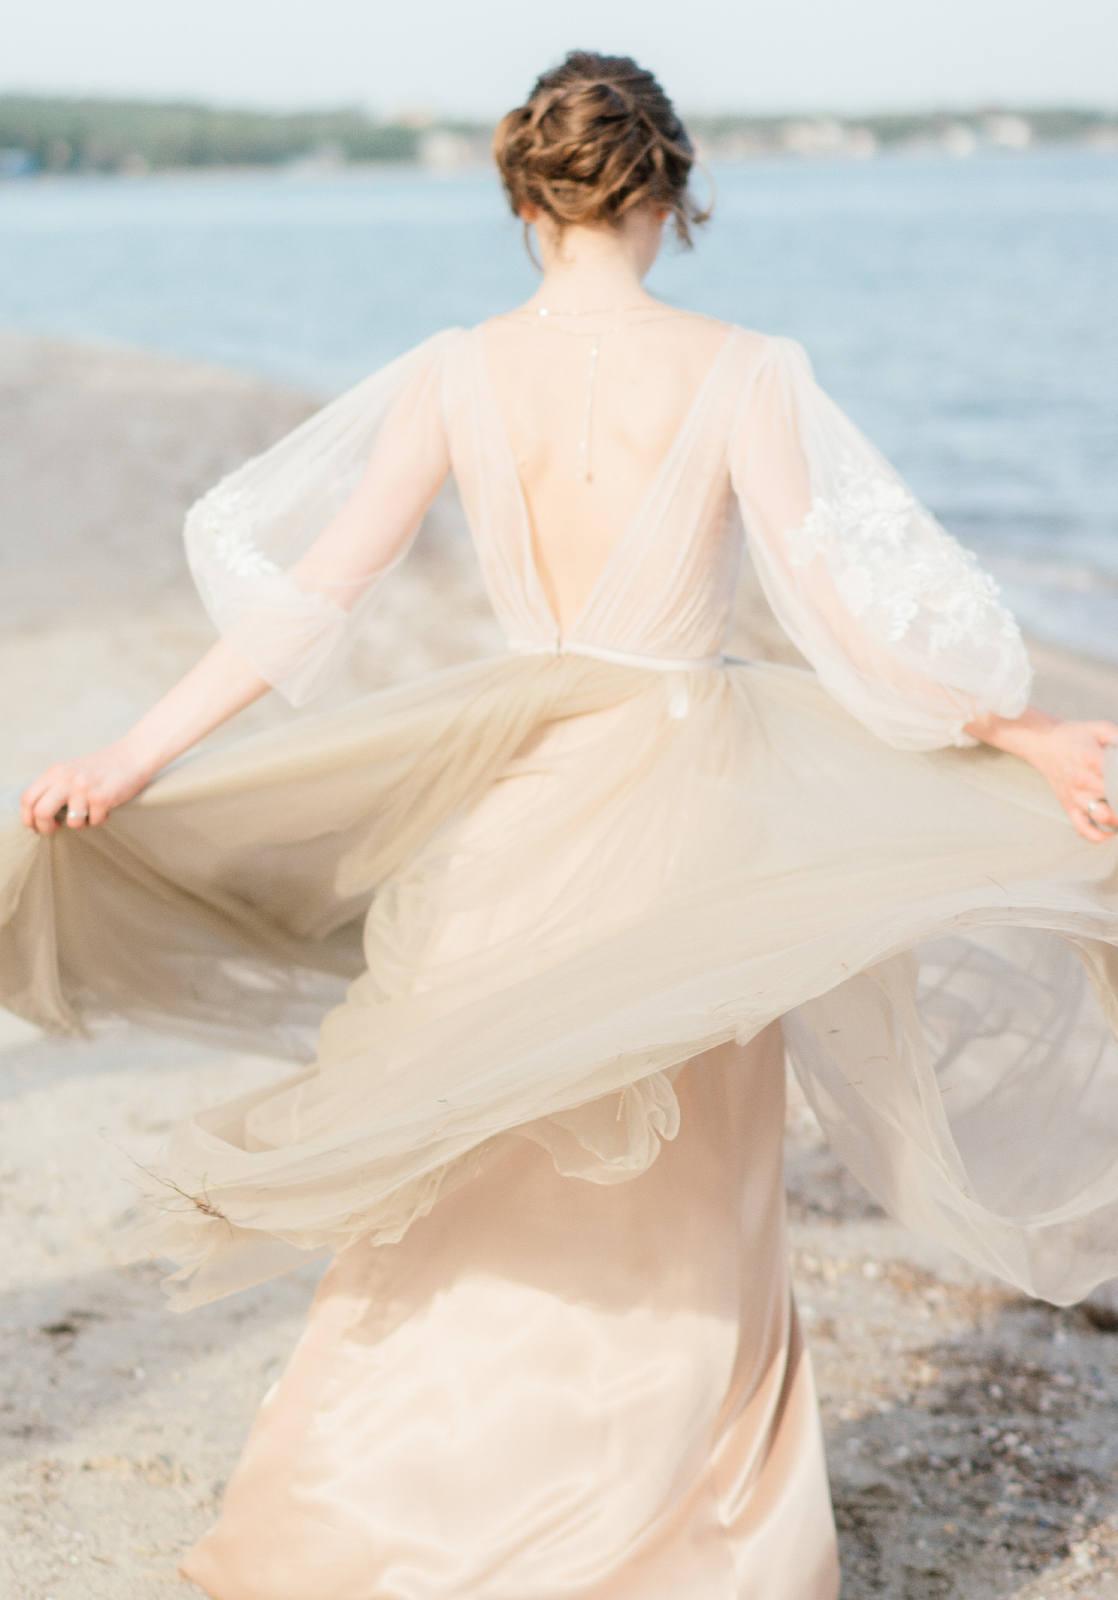 Нежная рустик-свадьба в лесу